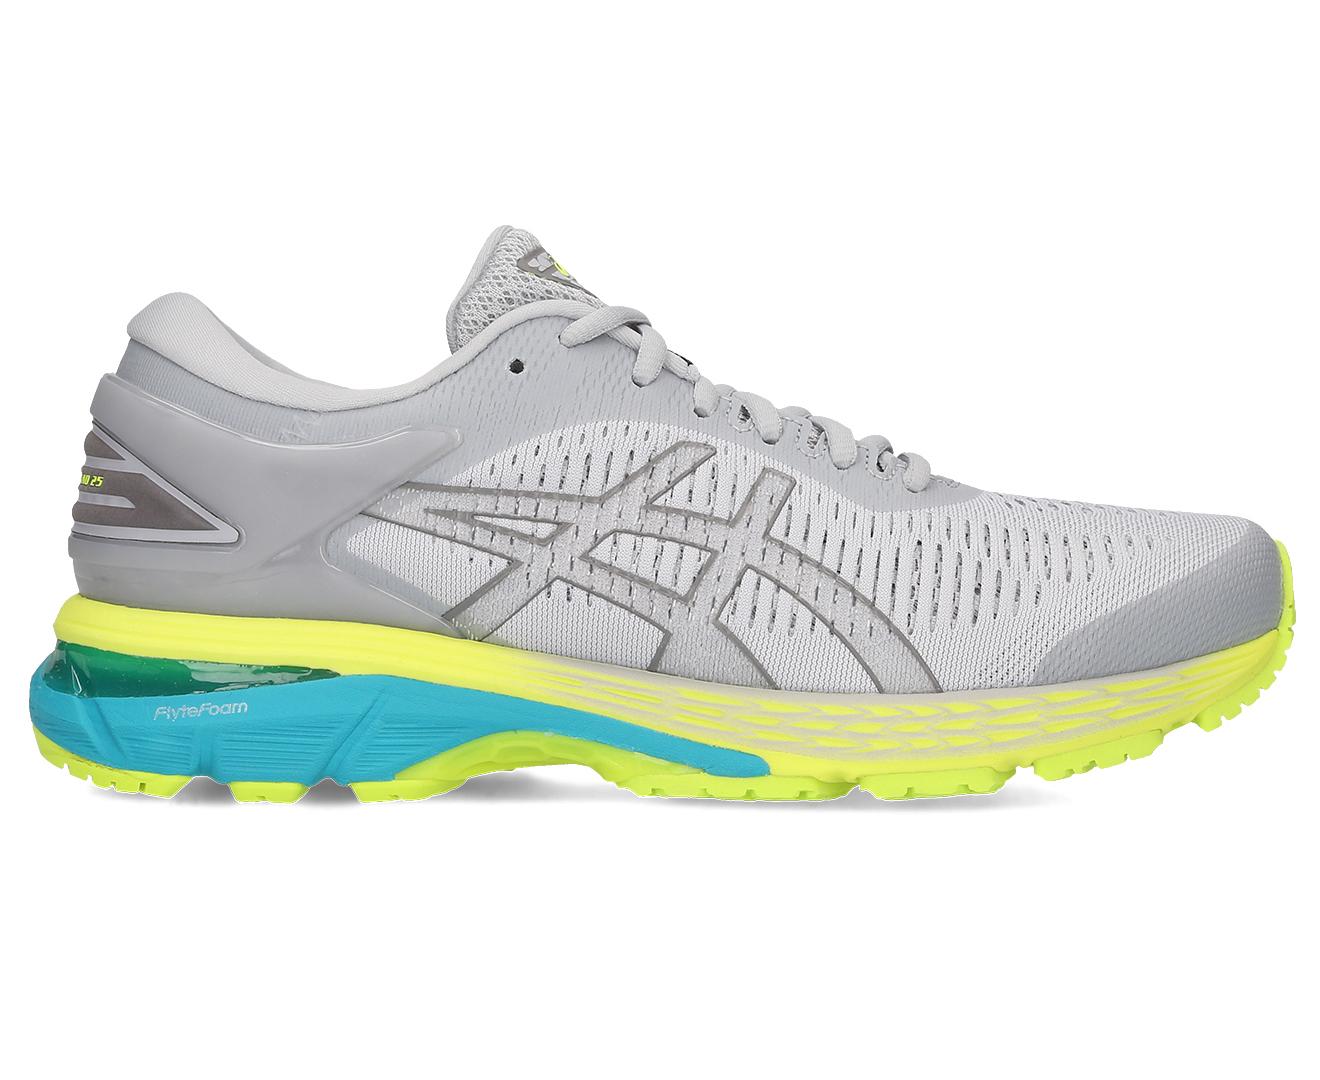 ASICS Women's Gel Kayano 25 Running Shoe (Mid GreyCarbon, Size 9) | Shoes |